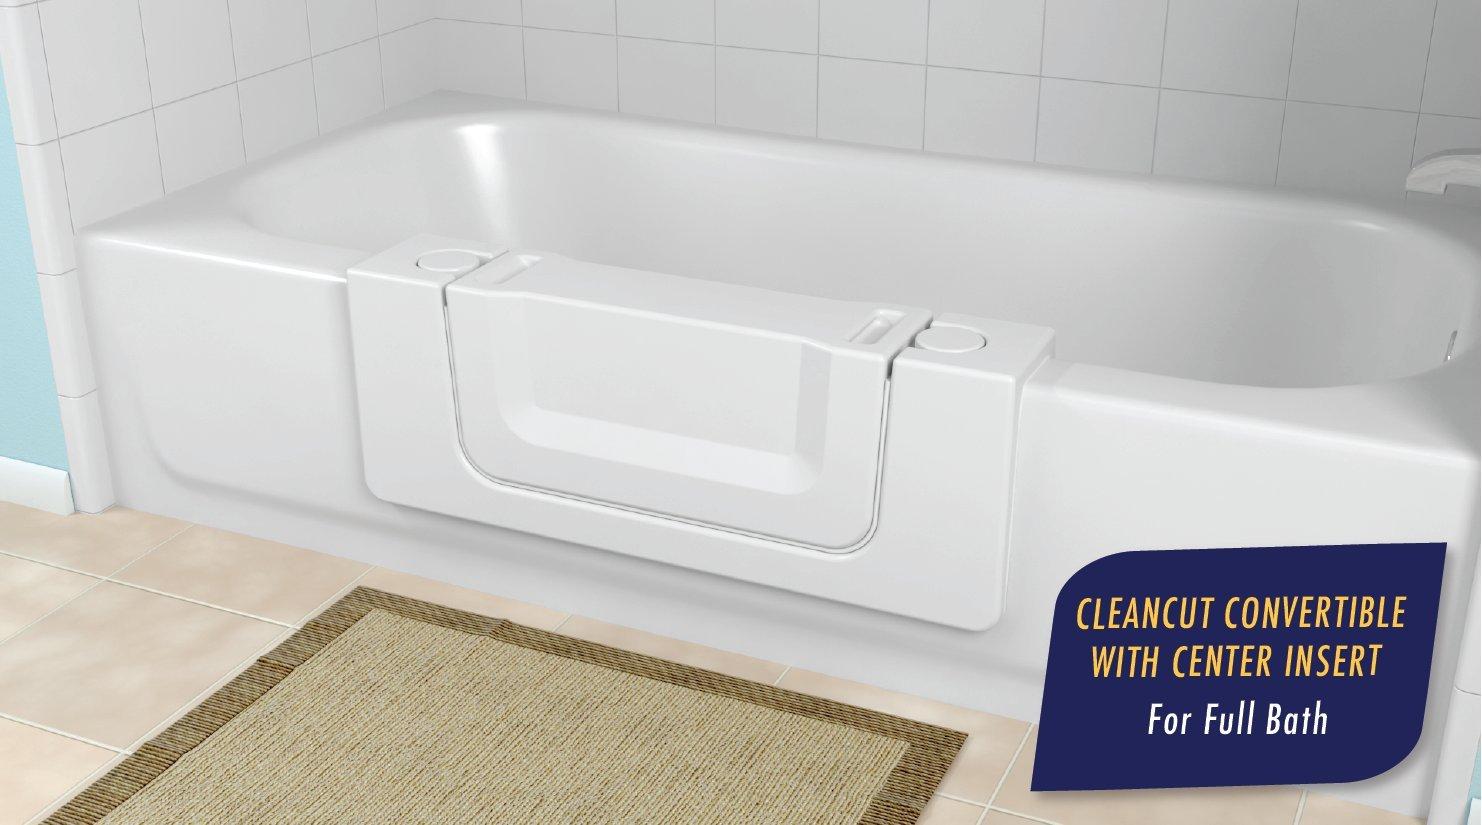 Amazon.com: CleanCut Convertible Bathtub Accessibility Kit - Size ...